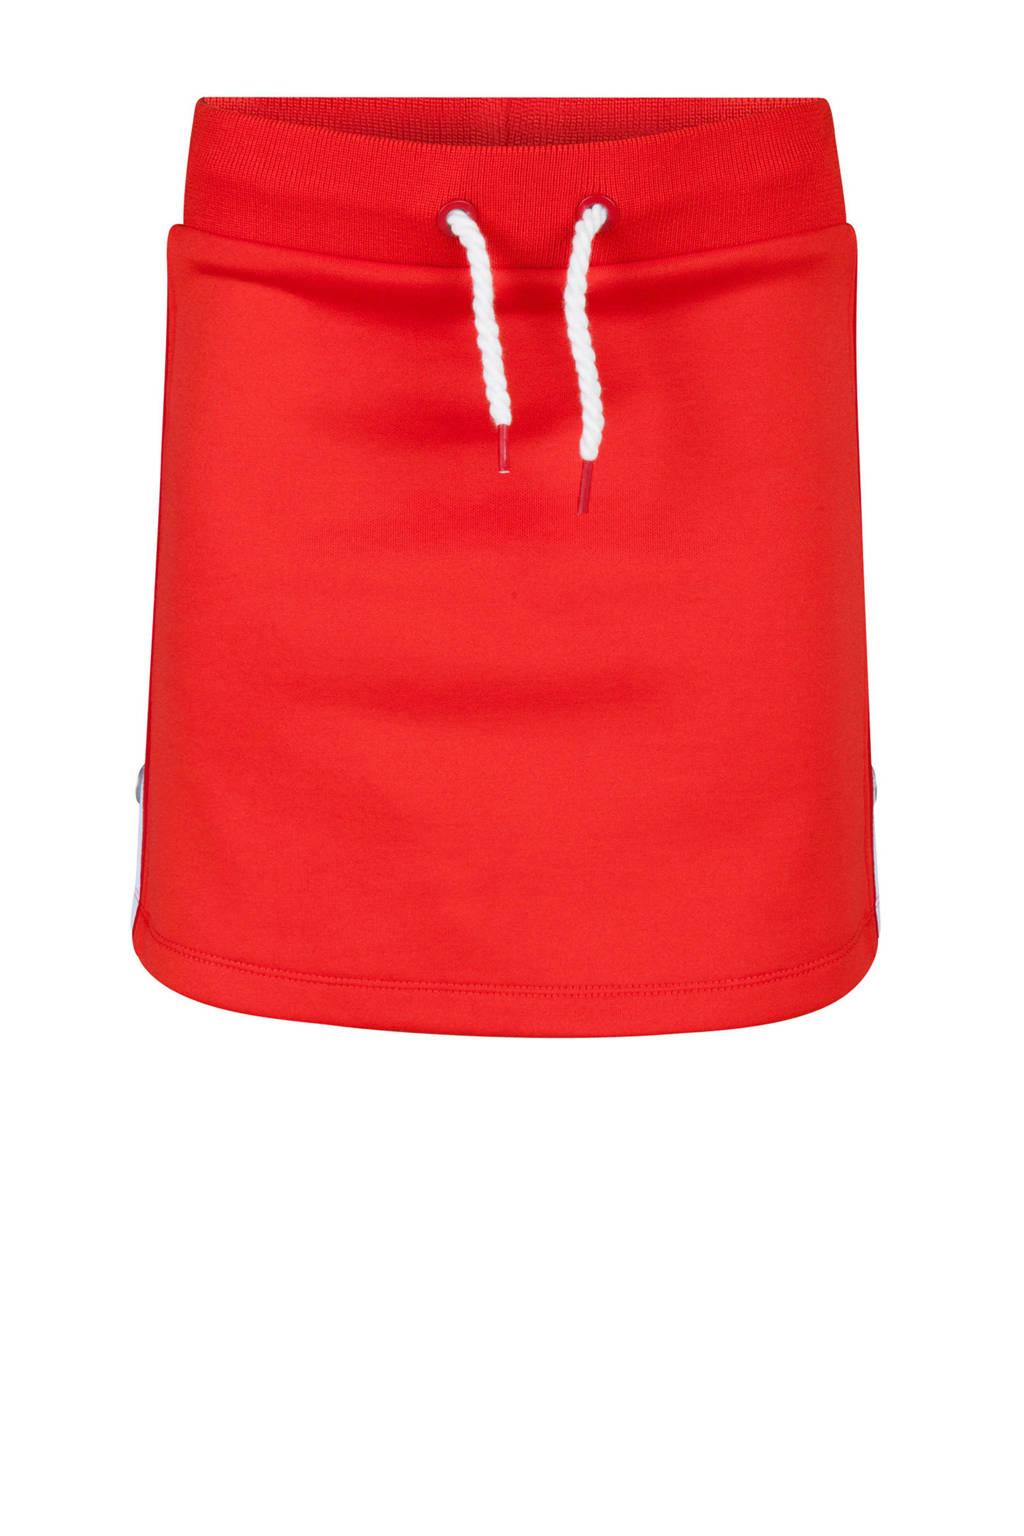 WE Fashion rok rood, Rood